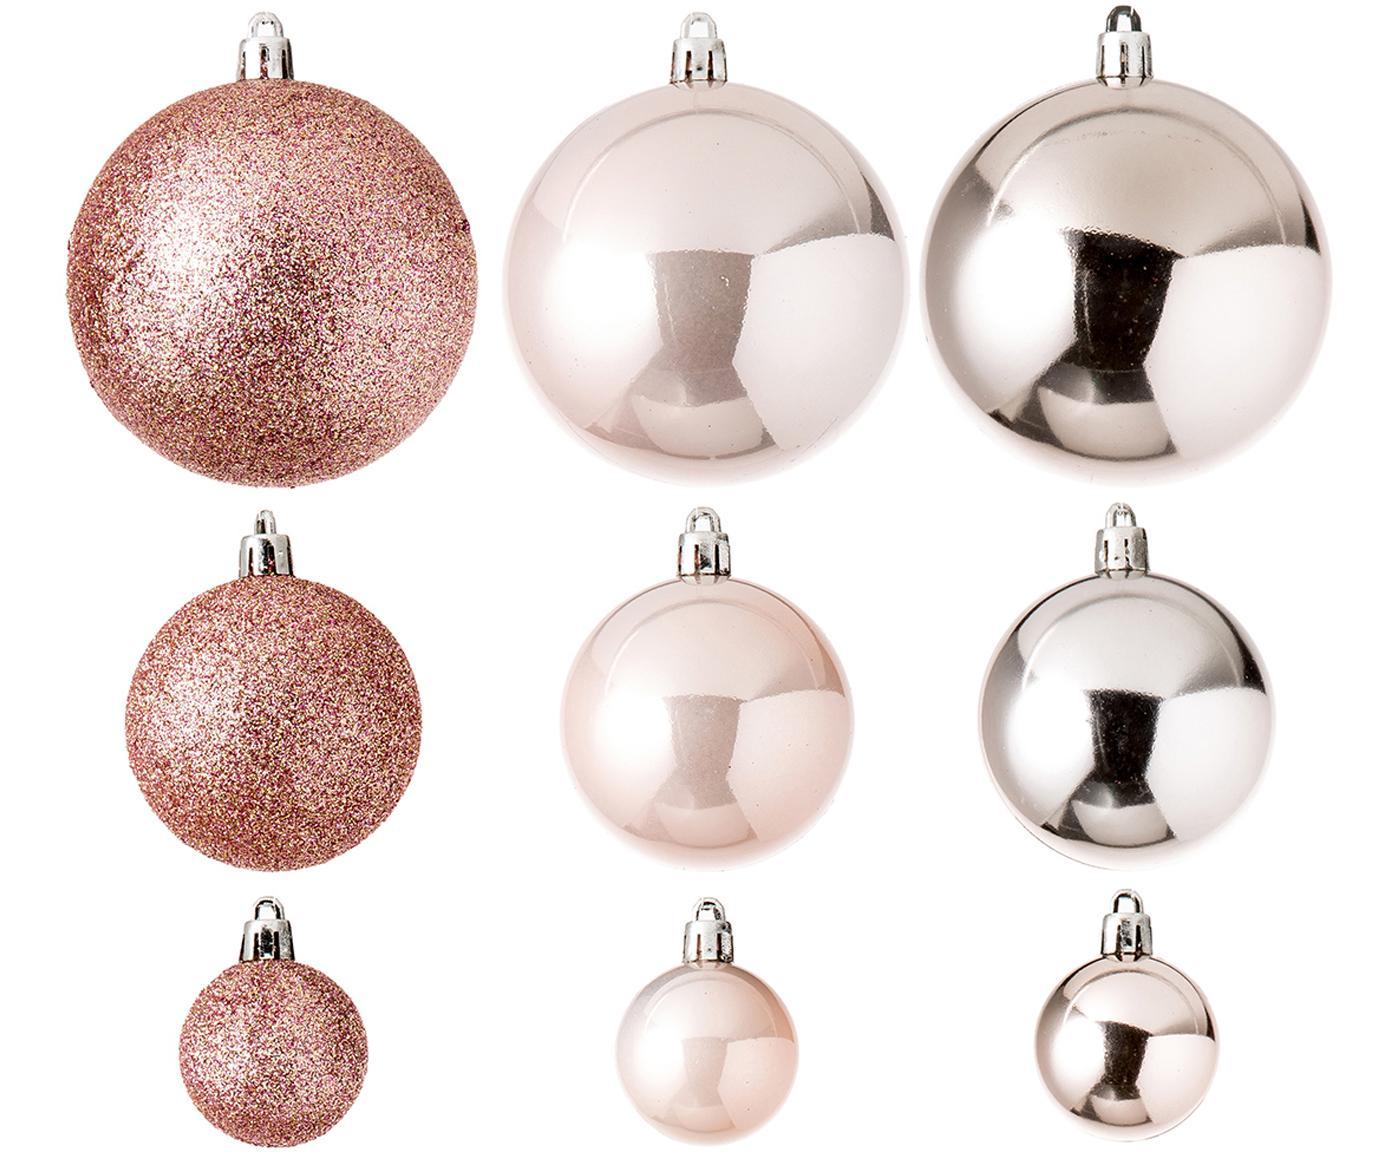 Weihnachtskugel-Set Silvia, 46-tlg., Kunststoff, Helles Rosa, Verschiedene Grössen